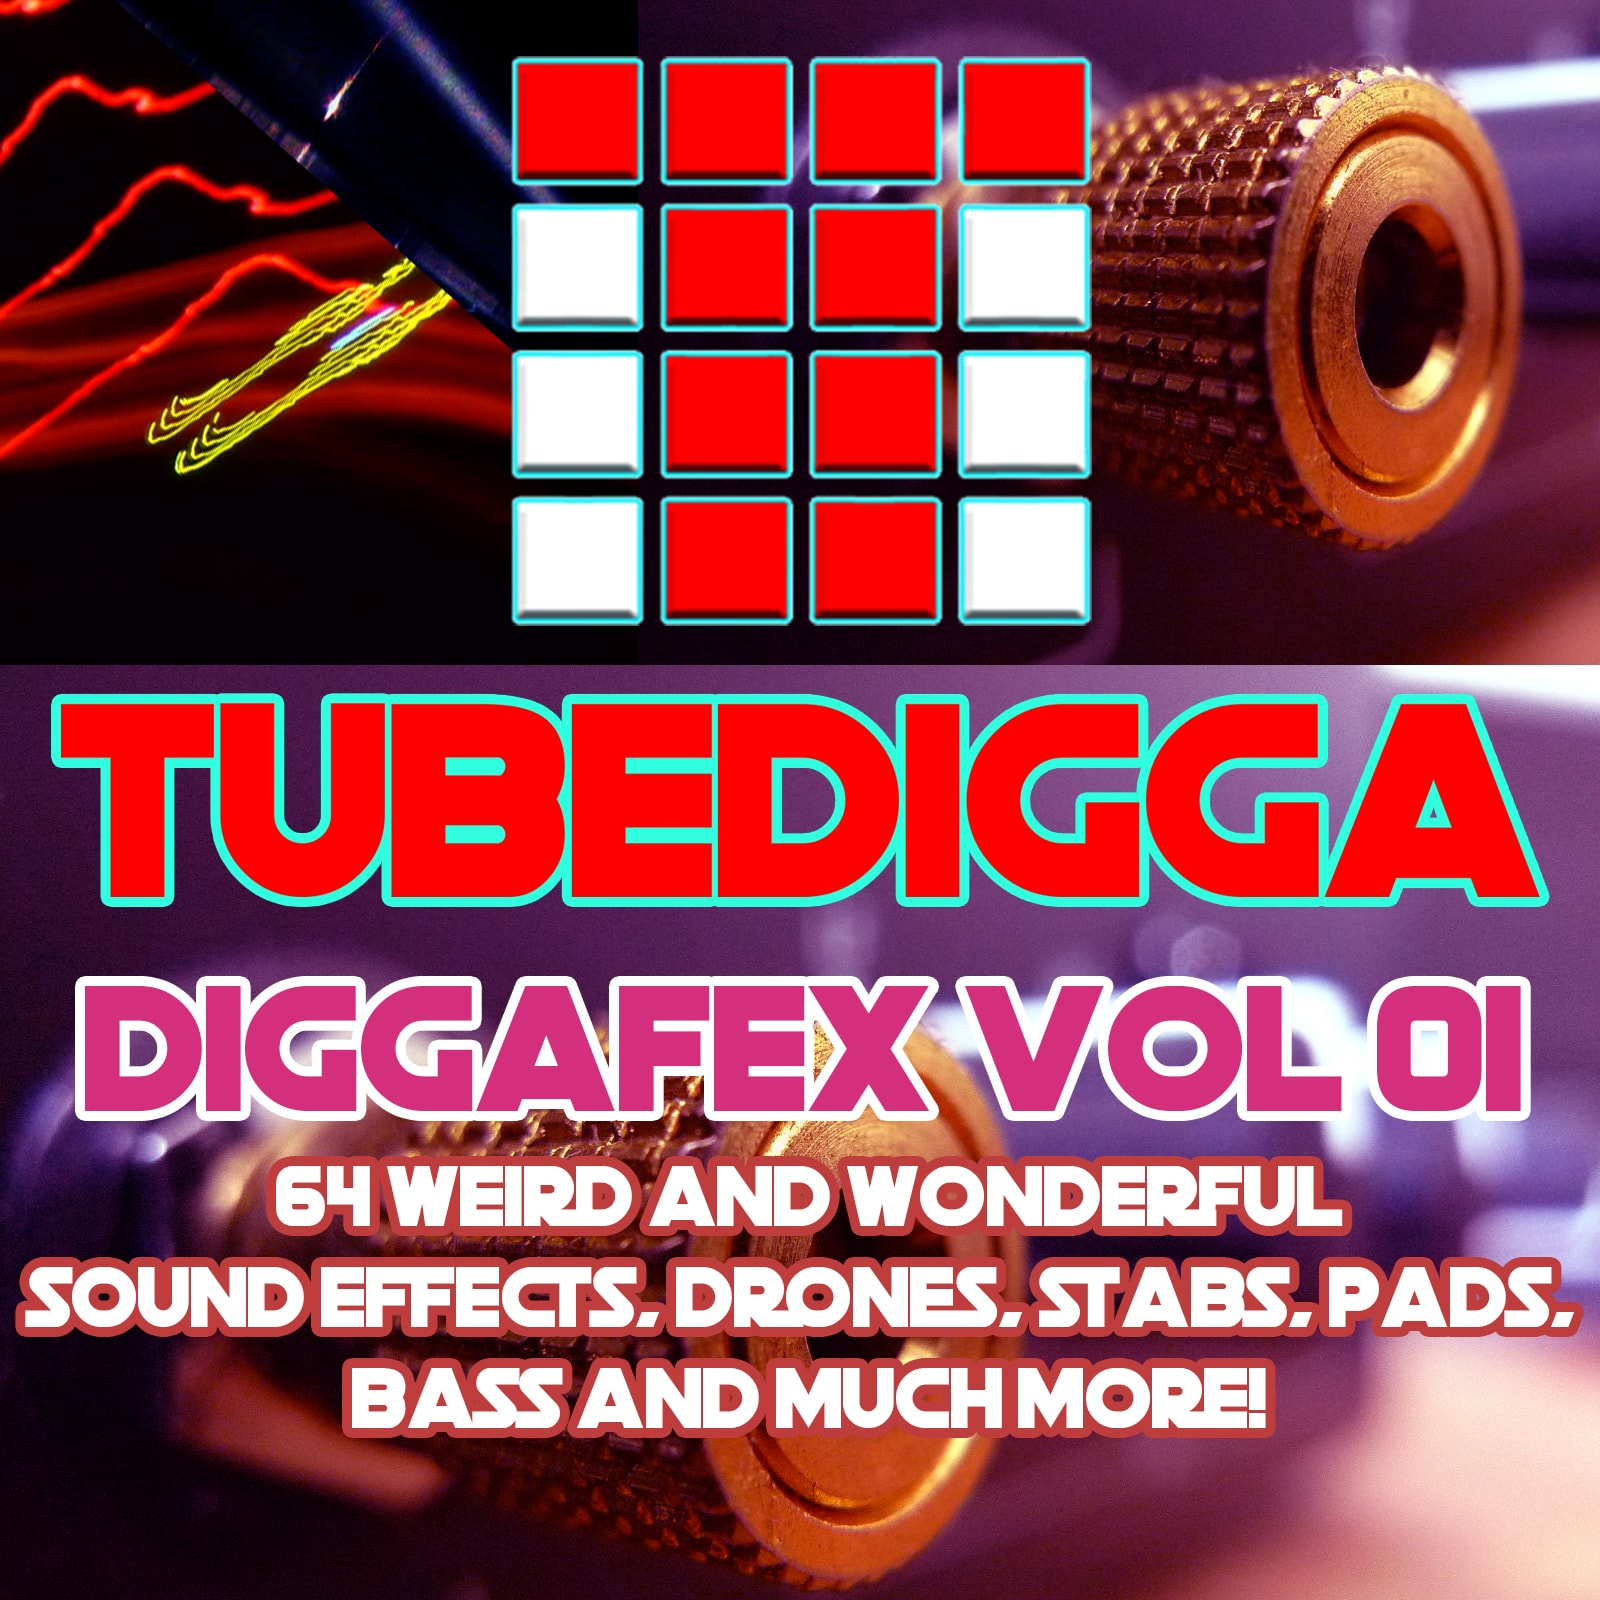 TUBEDIGGA DIGGAFEX VOL 01